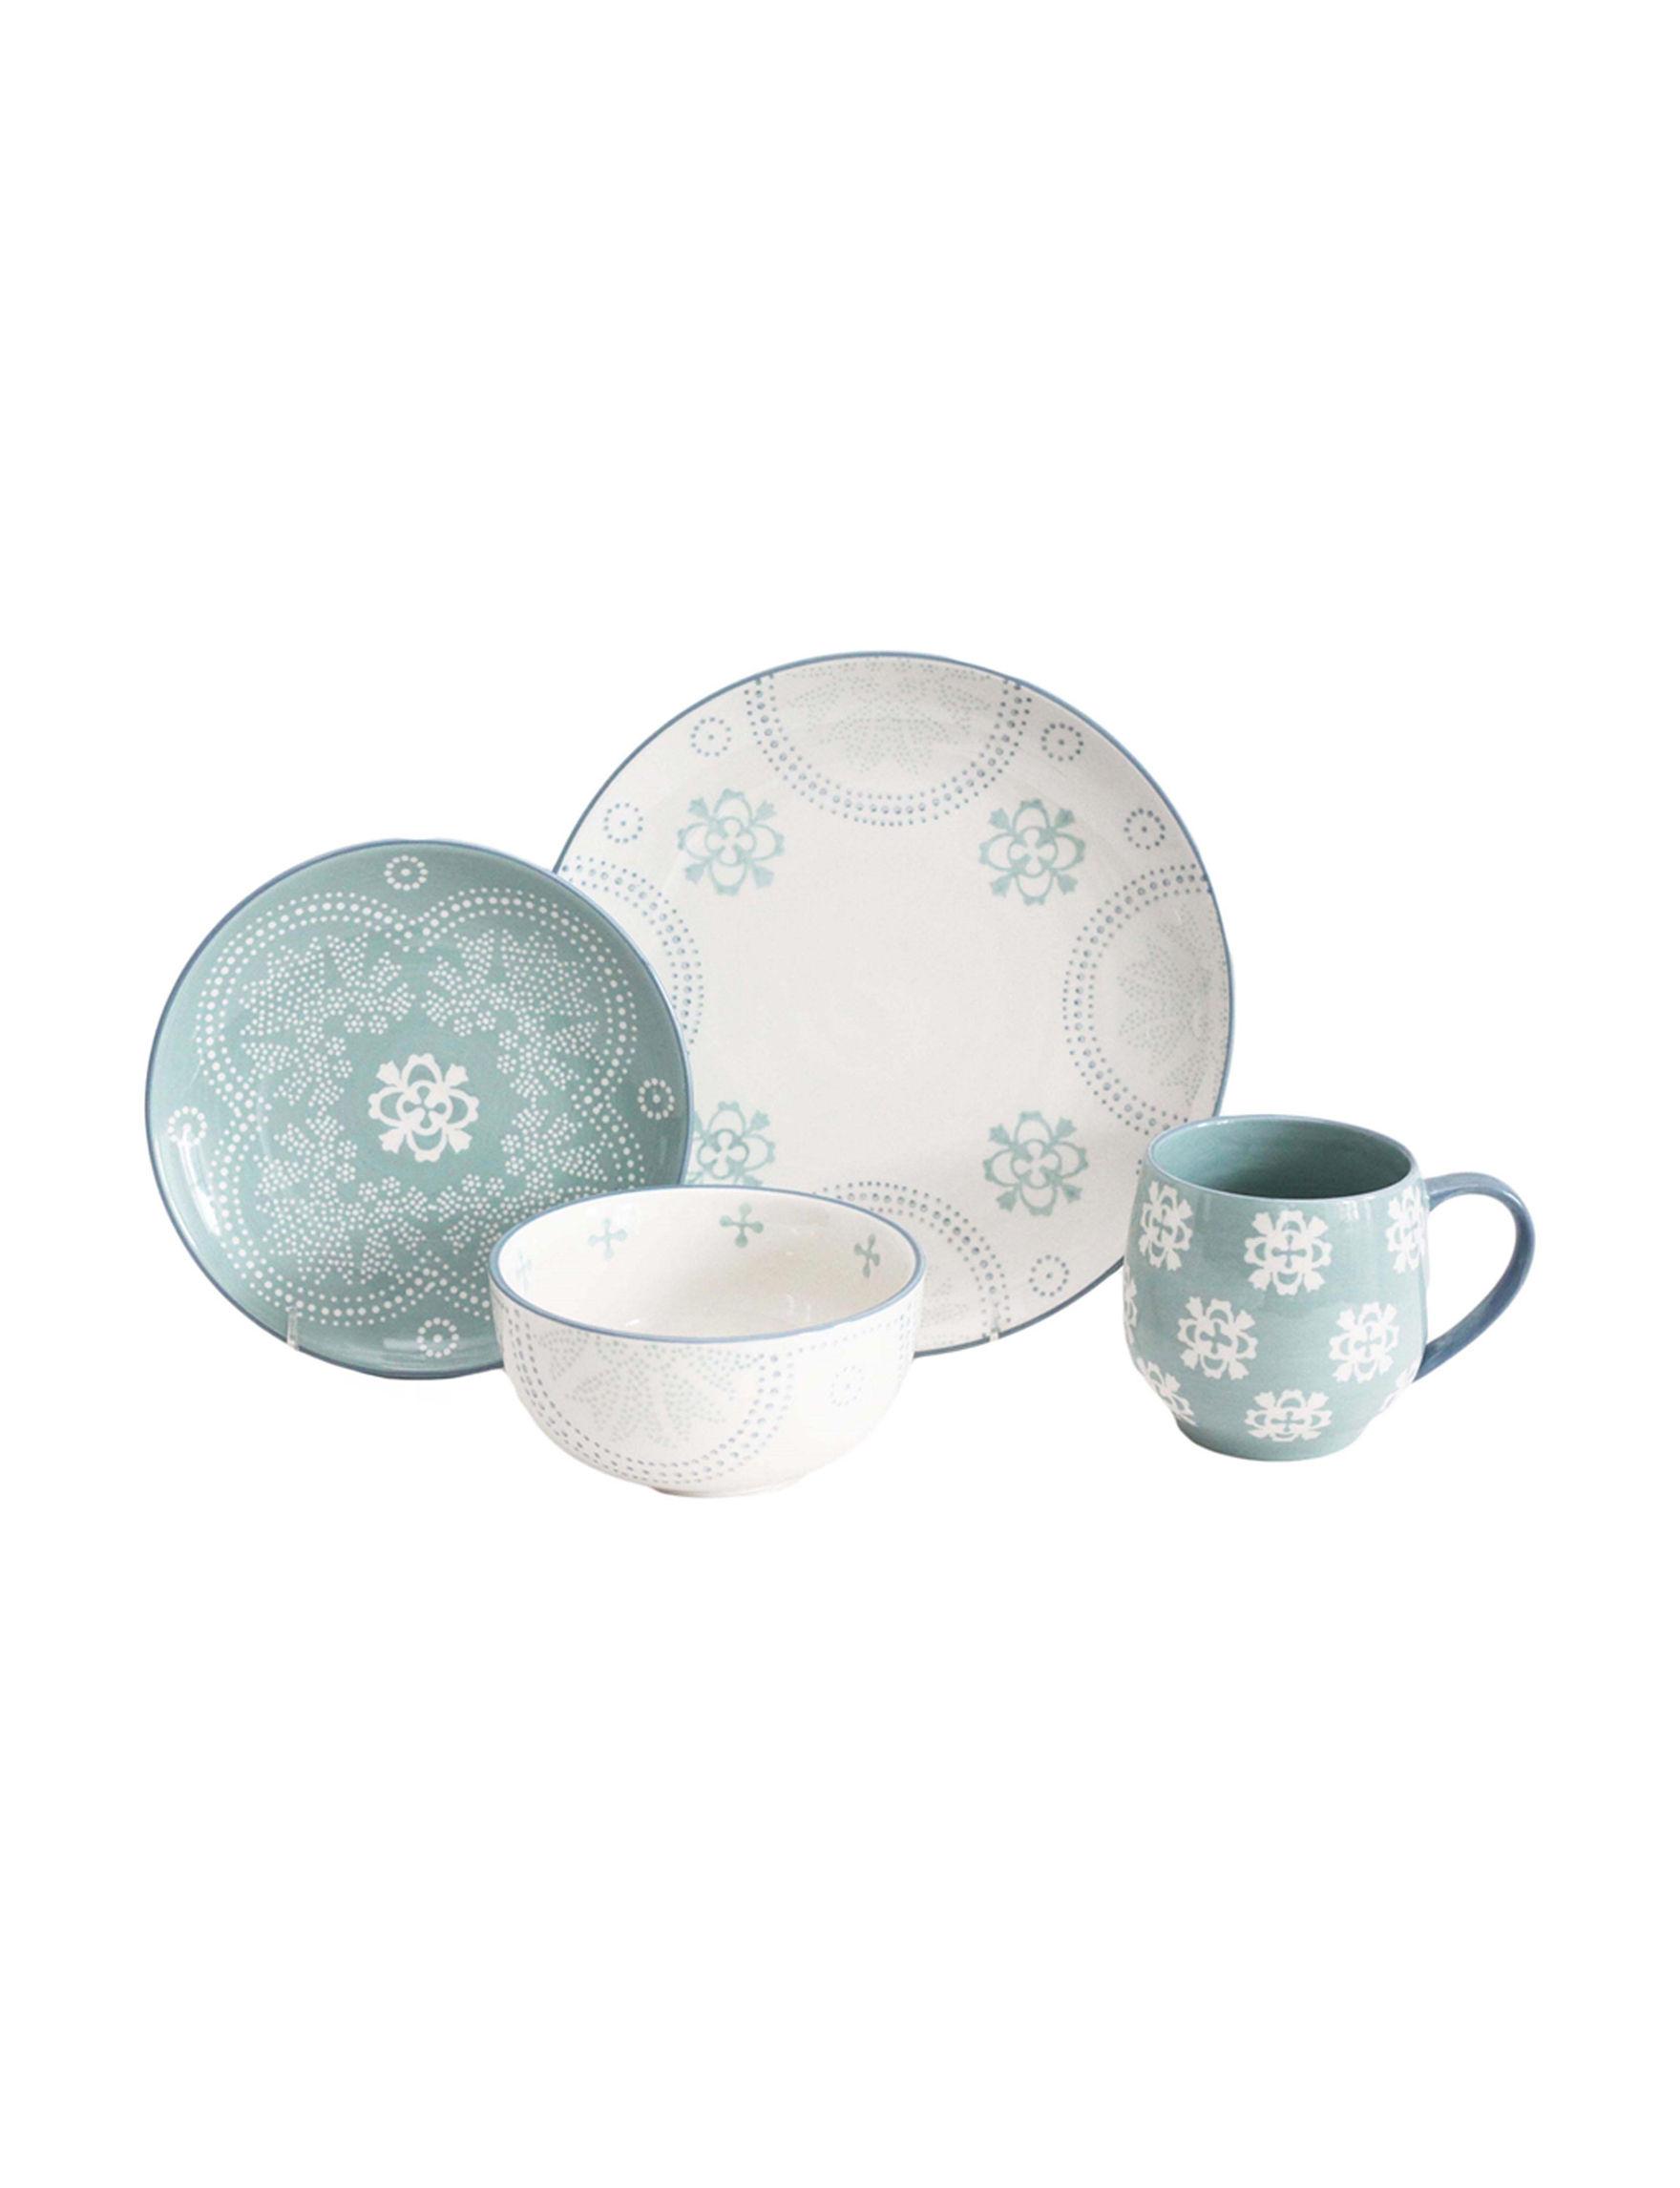 Baum Bros Imports Blue / White Dinnerware Sets Dinnerware